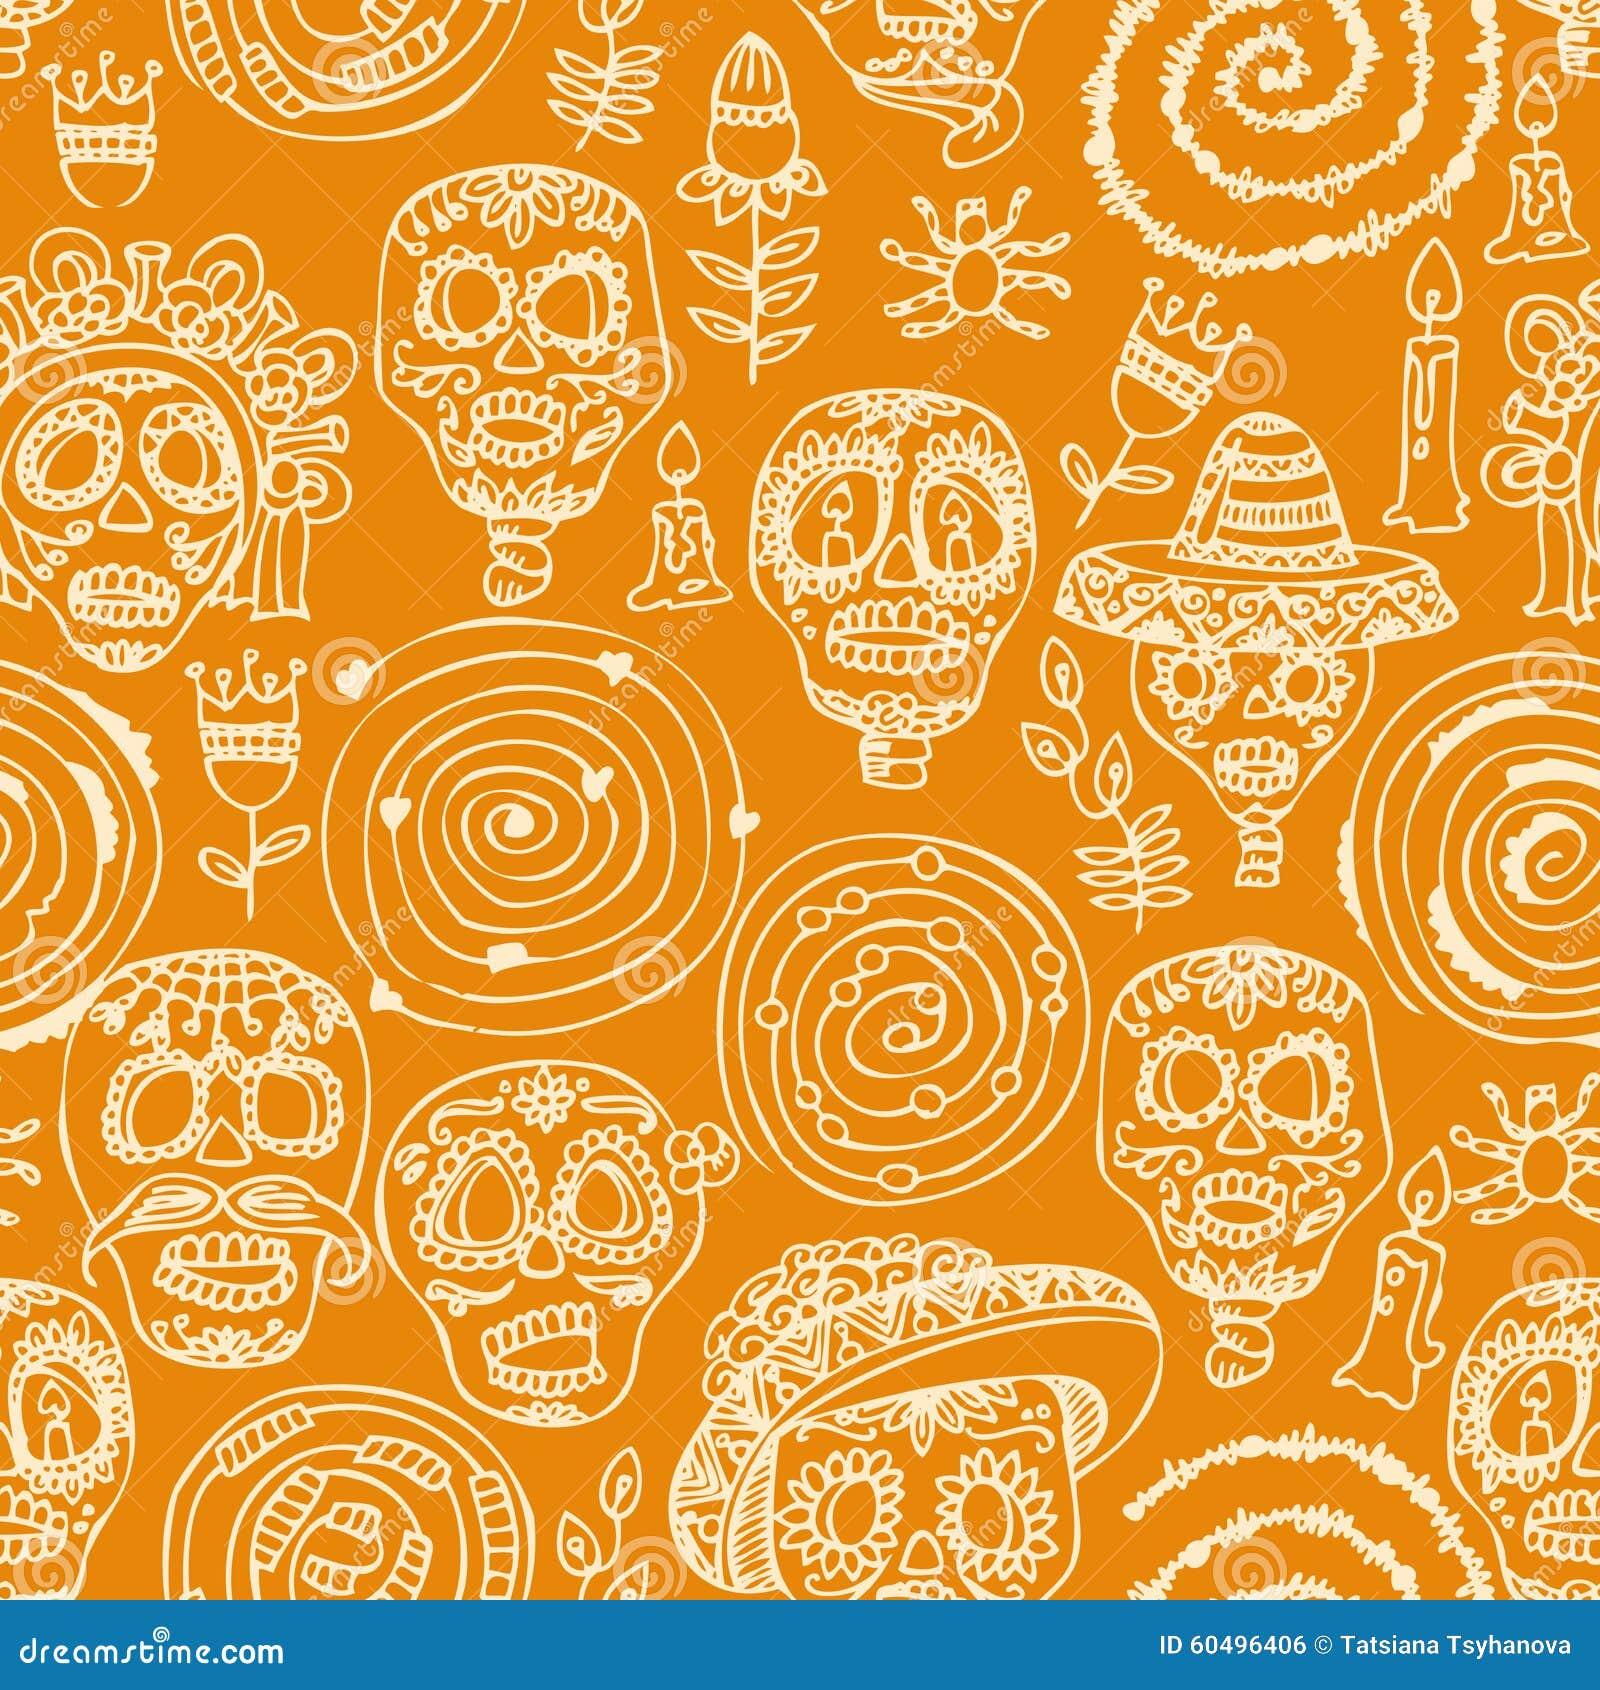 In Style Home Decor Girl Skull Seamless Pattern Cartoon Vector Cartoondealer